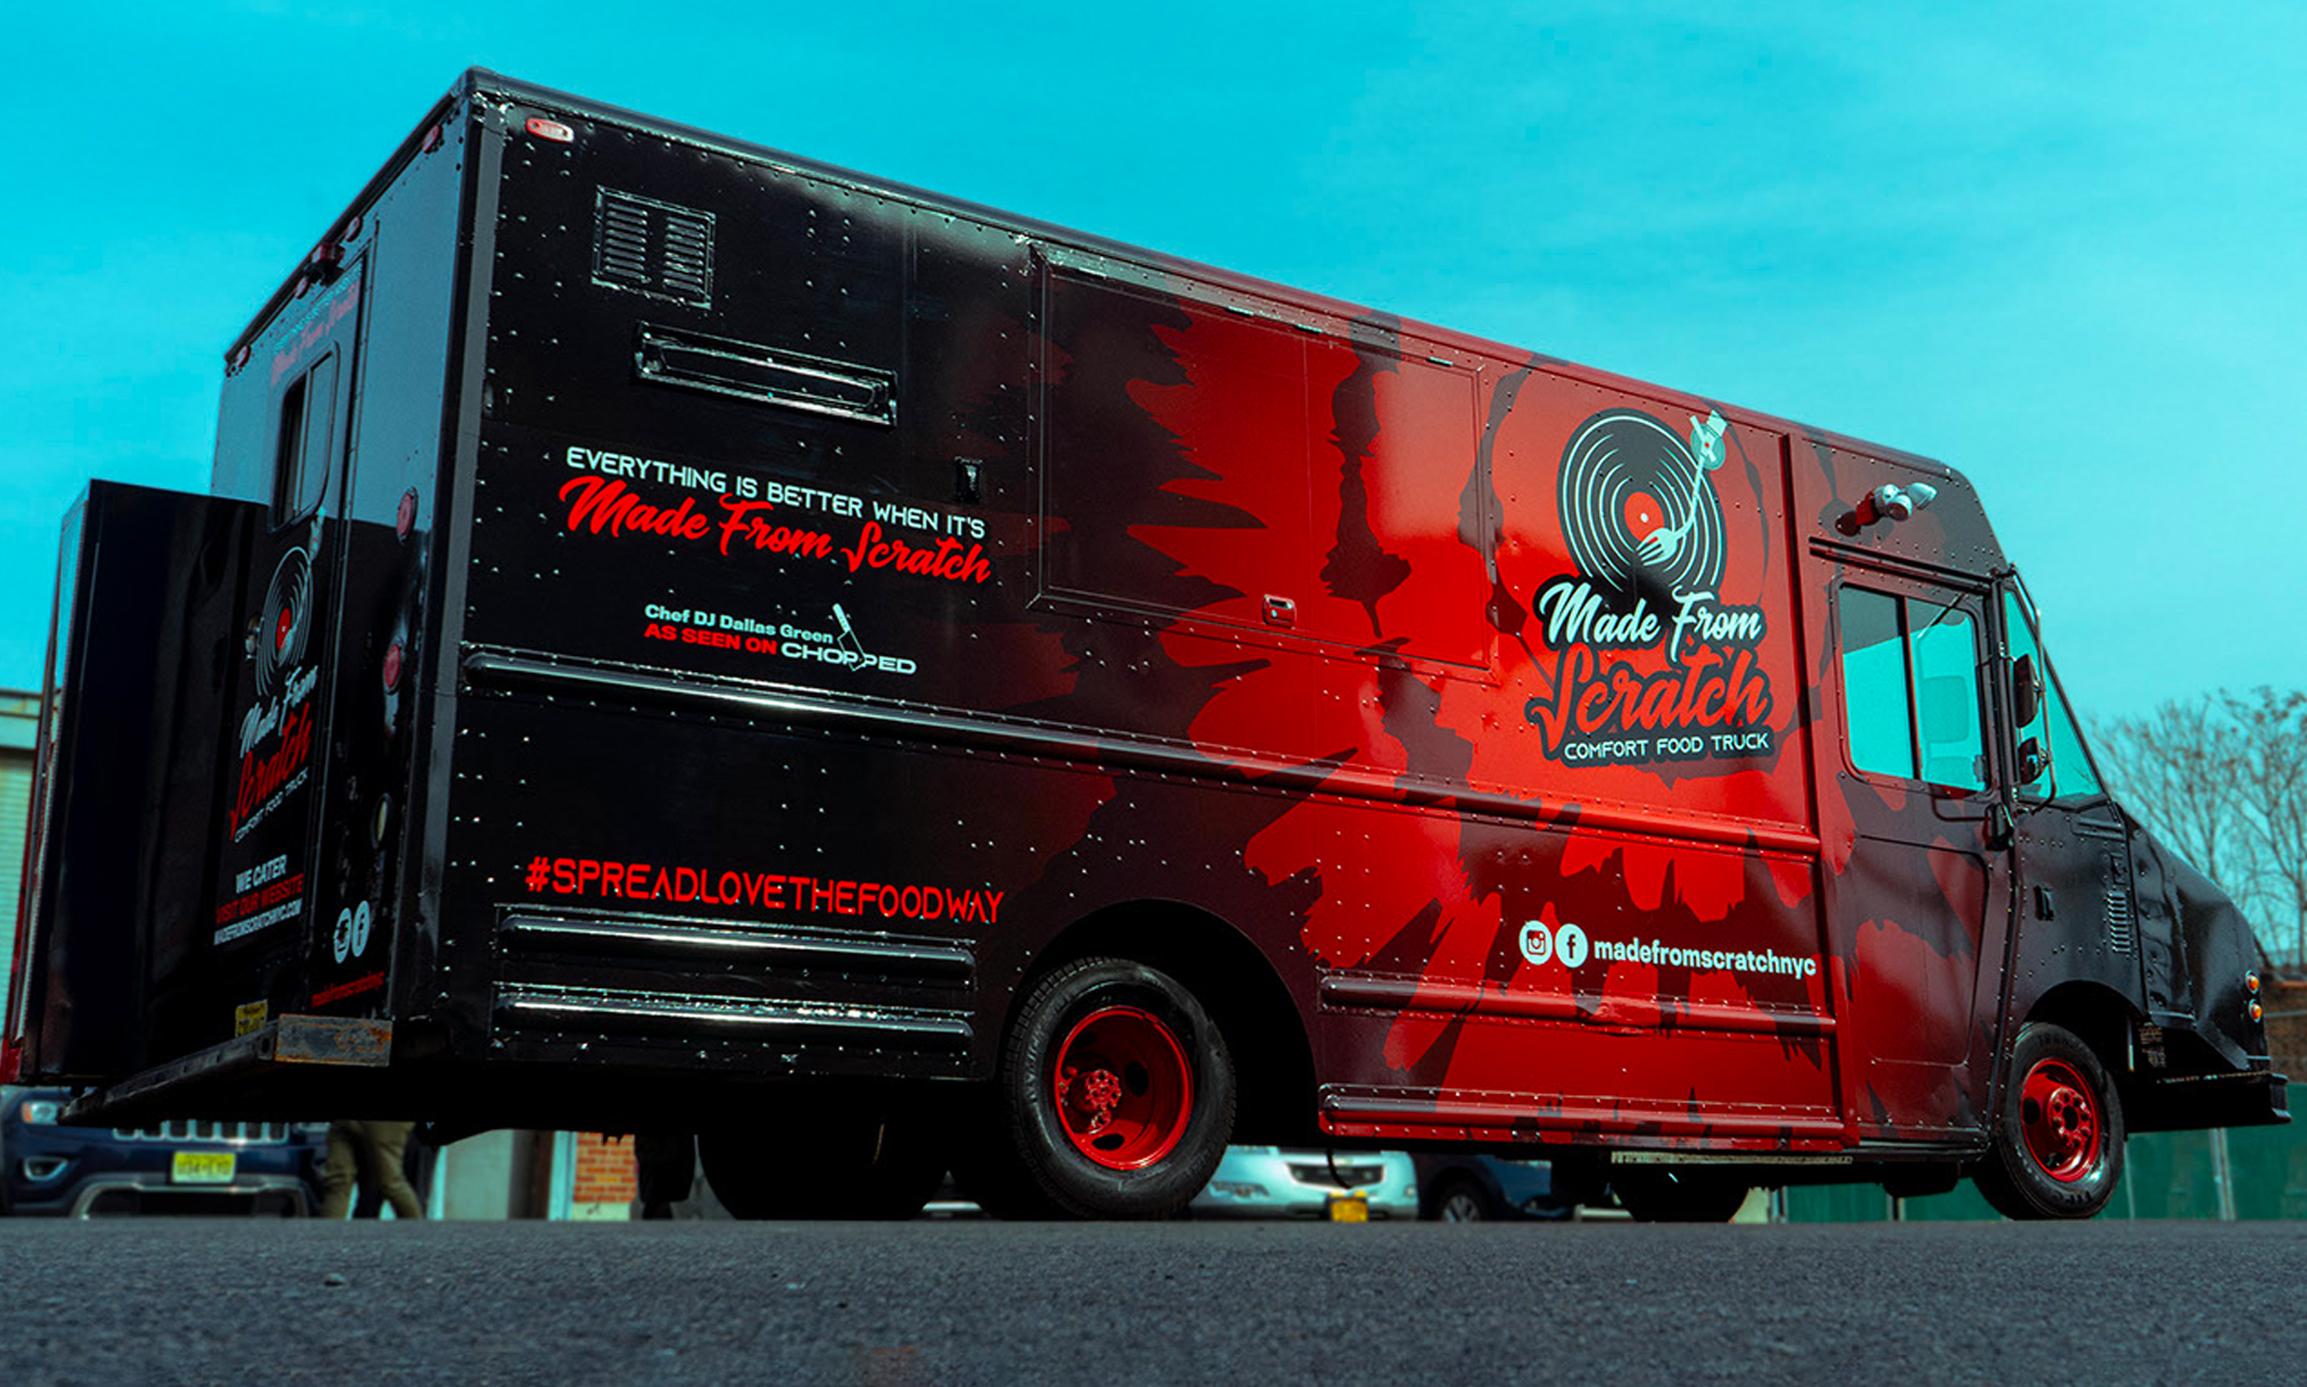 Made From Scratch Branding & Food Truck Design